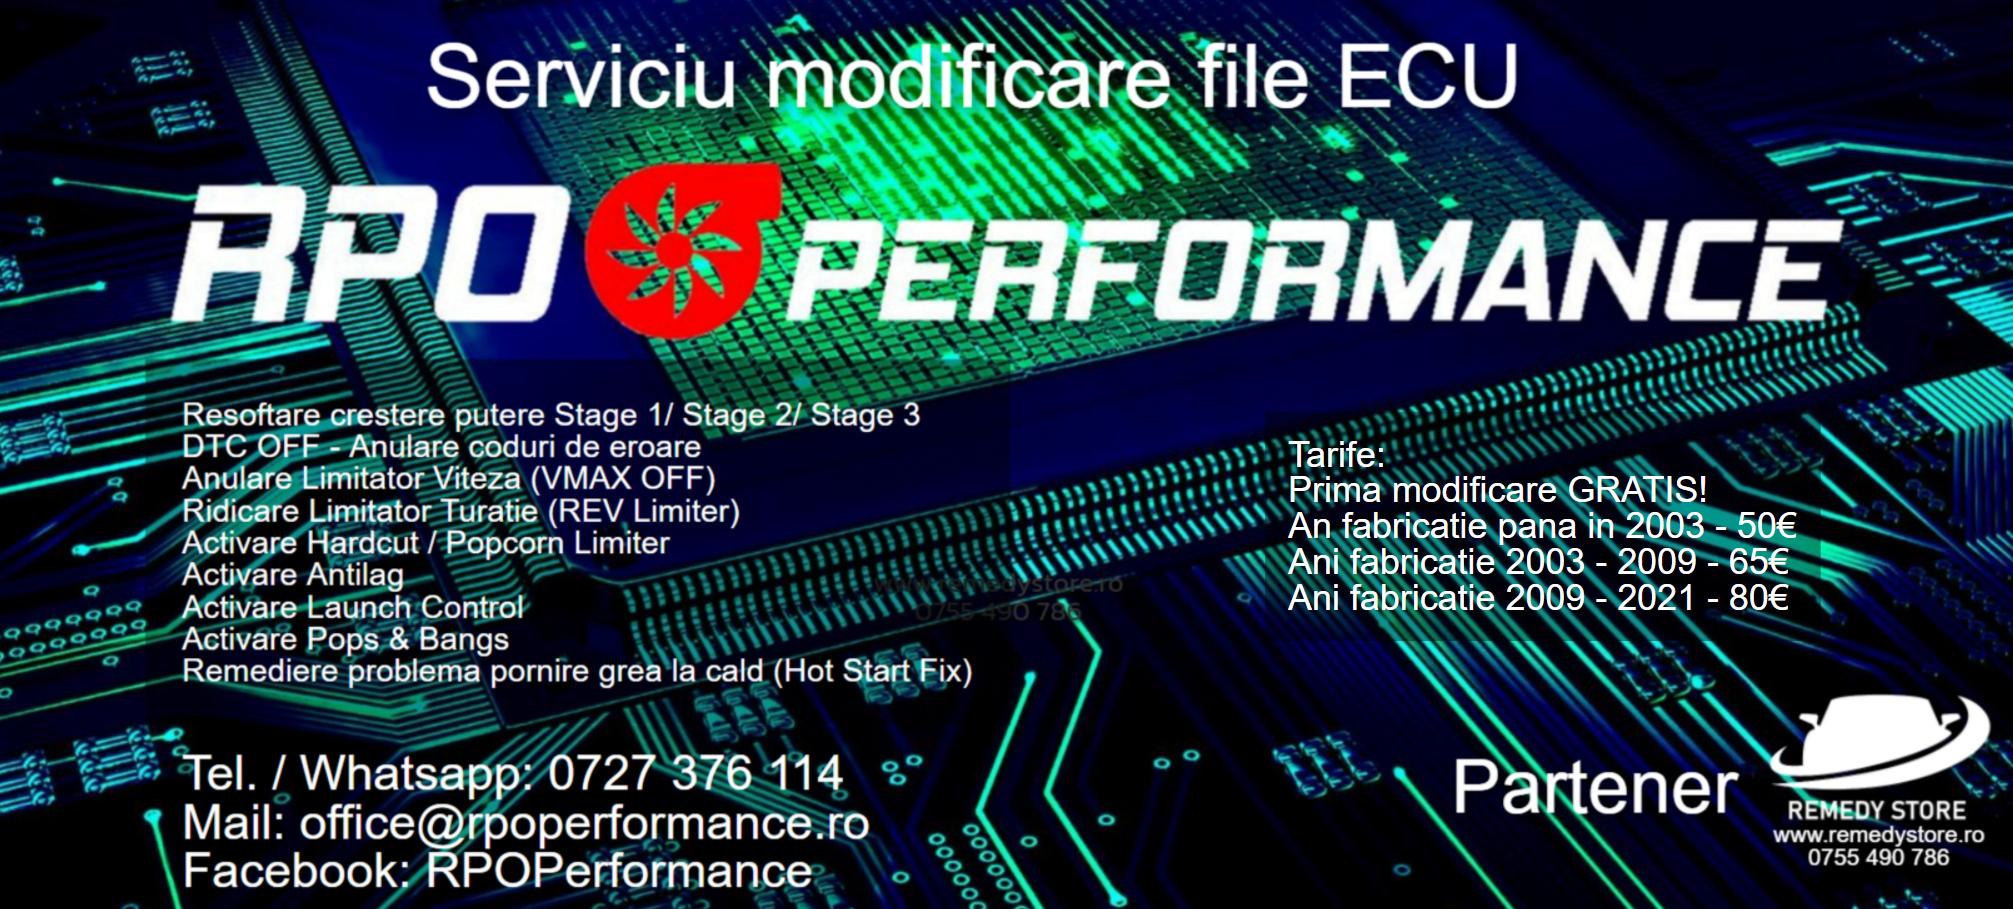 Oferta tarife RPO Performance